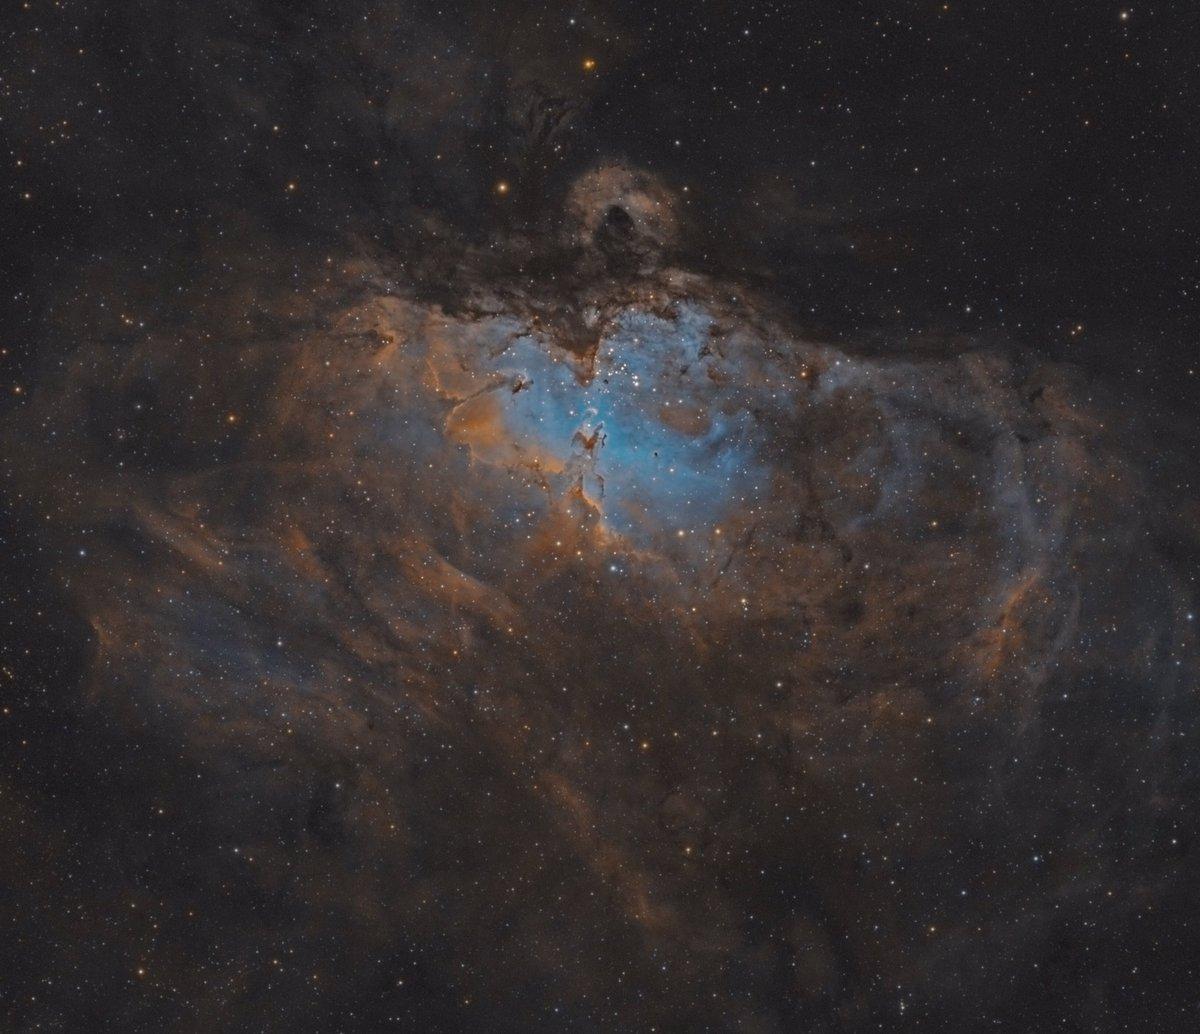 Hubble palette of the Eagle nebula was finally done. Subs:  Ha: 63x180sec OIII: 60x180sec SII: 63x180sec Gain: 139 Temp: -10 degrees #astro #astronomy #astronomia #Astrophotography #eaglenebula #deepskyobjects #messier16 #amateurphotography #nasa #space #universe #esa #Slovakia https://t.co/pZpK7lDf9l